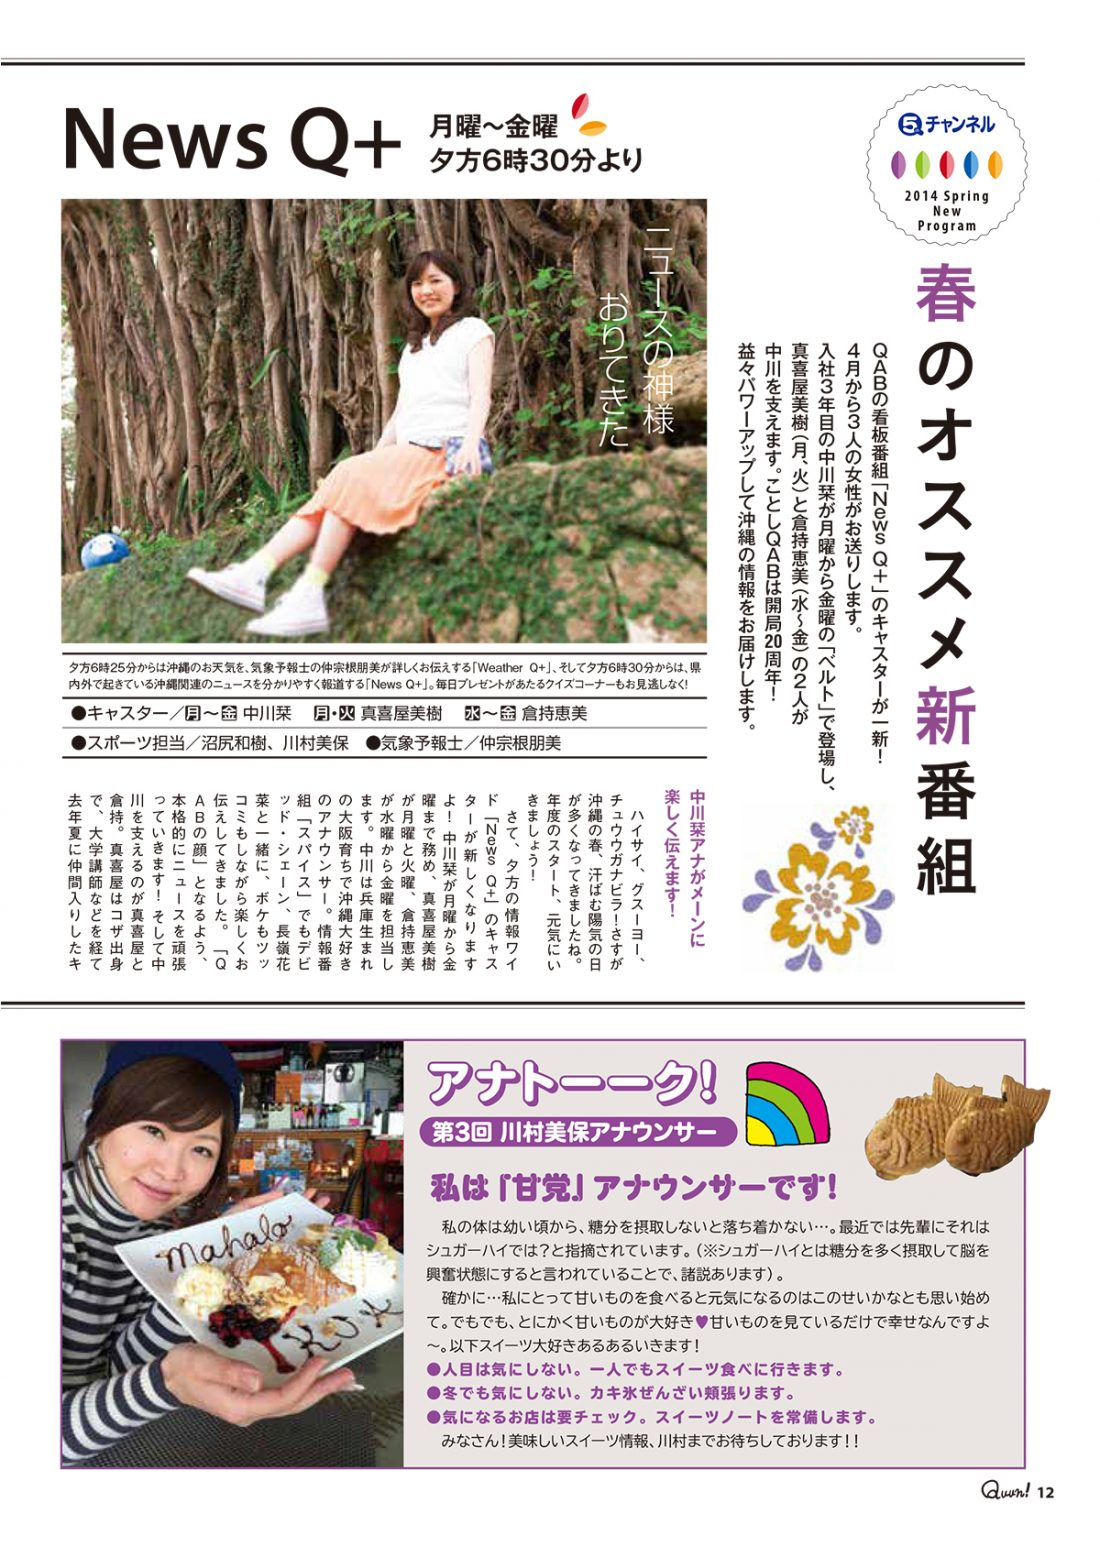 http://www.qab.co.jp/qgoro/wp-content/uploads/quun_0314-1100x1558.jpg